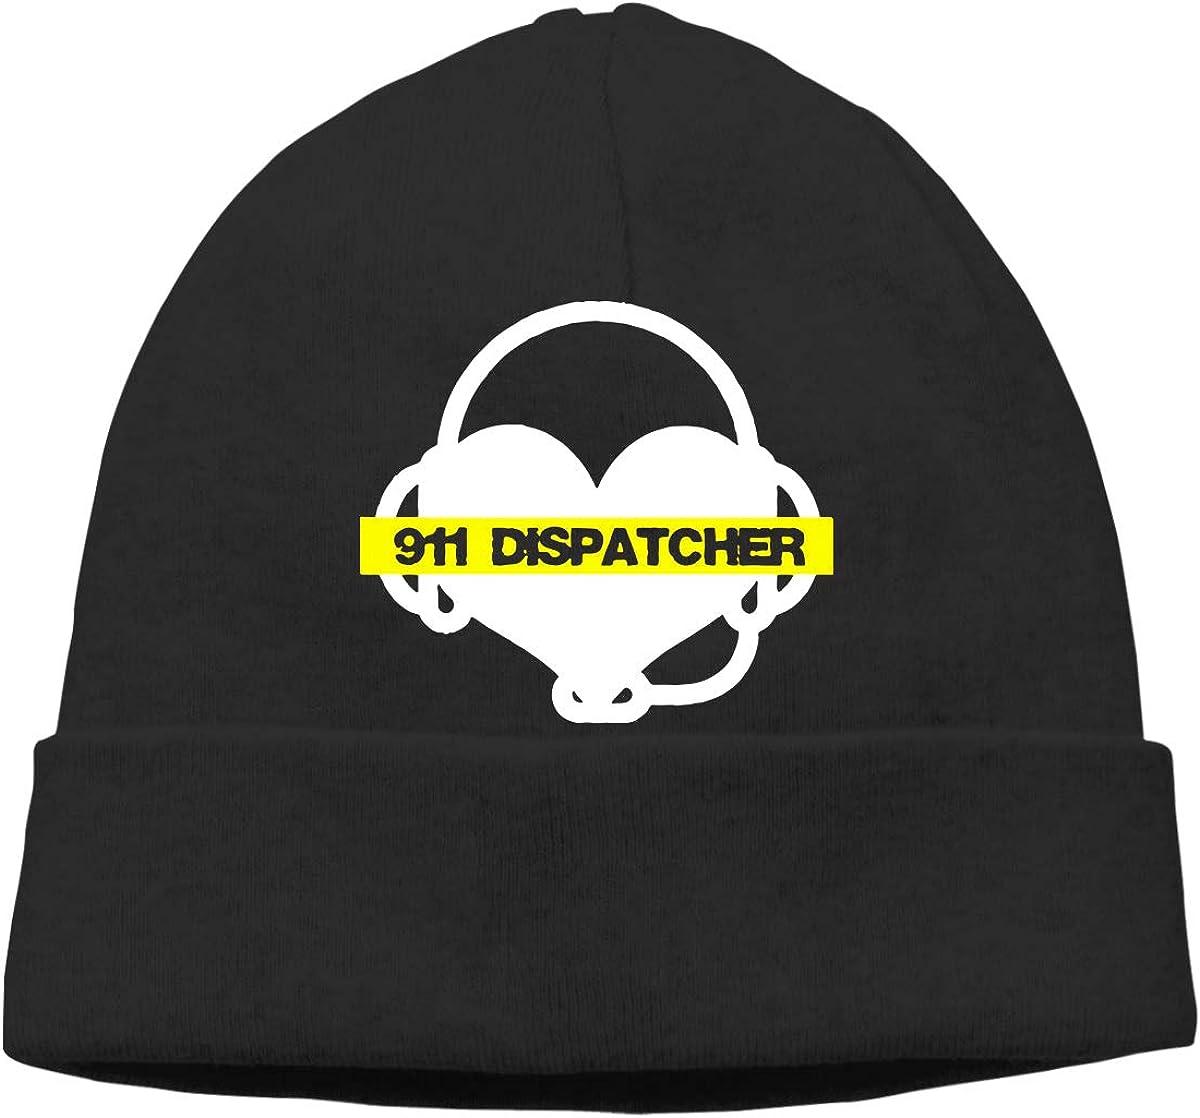 GDSG5/&4 911 Dispatcher Men /& Women Helmet Liner Cycling Beanie Hat